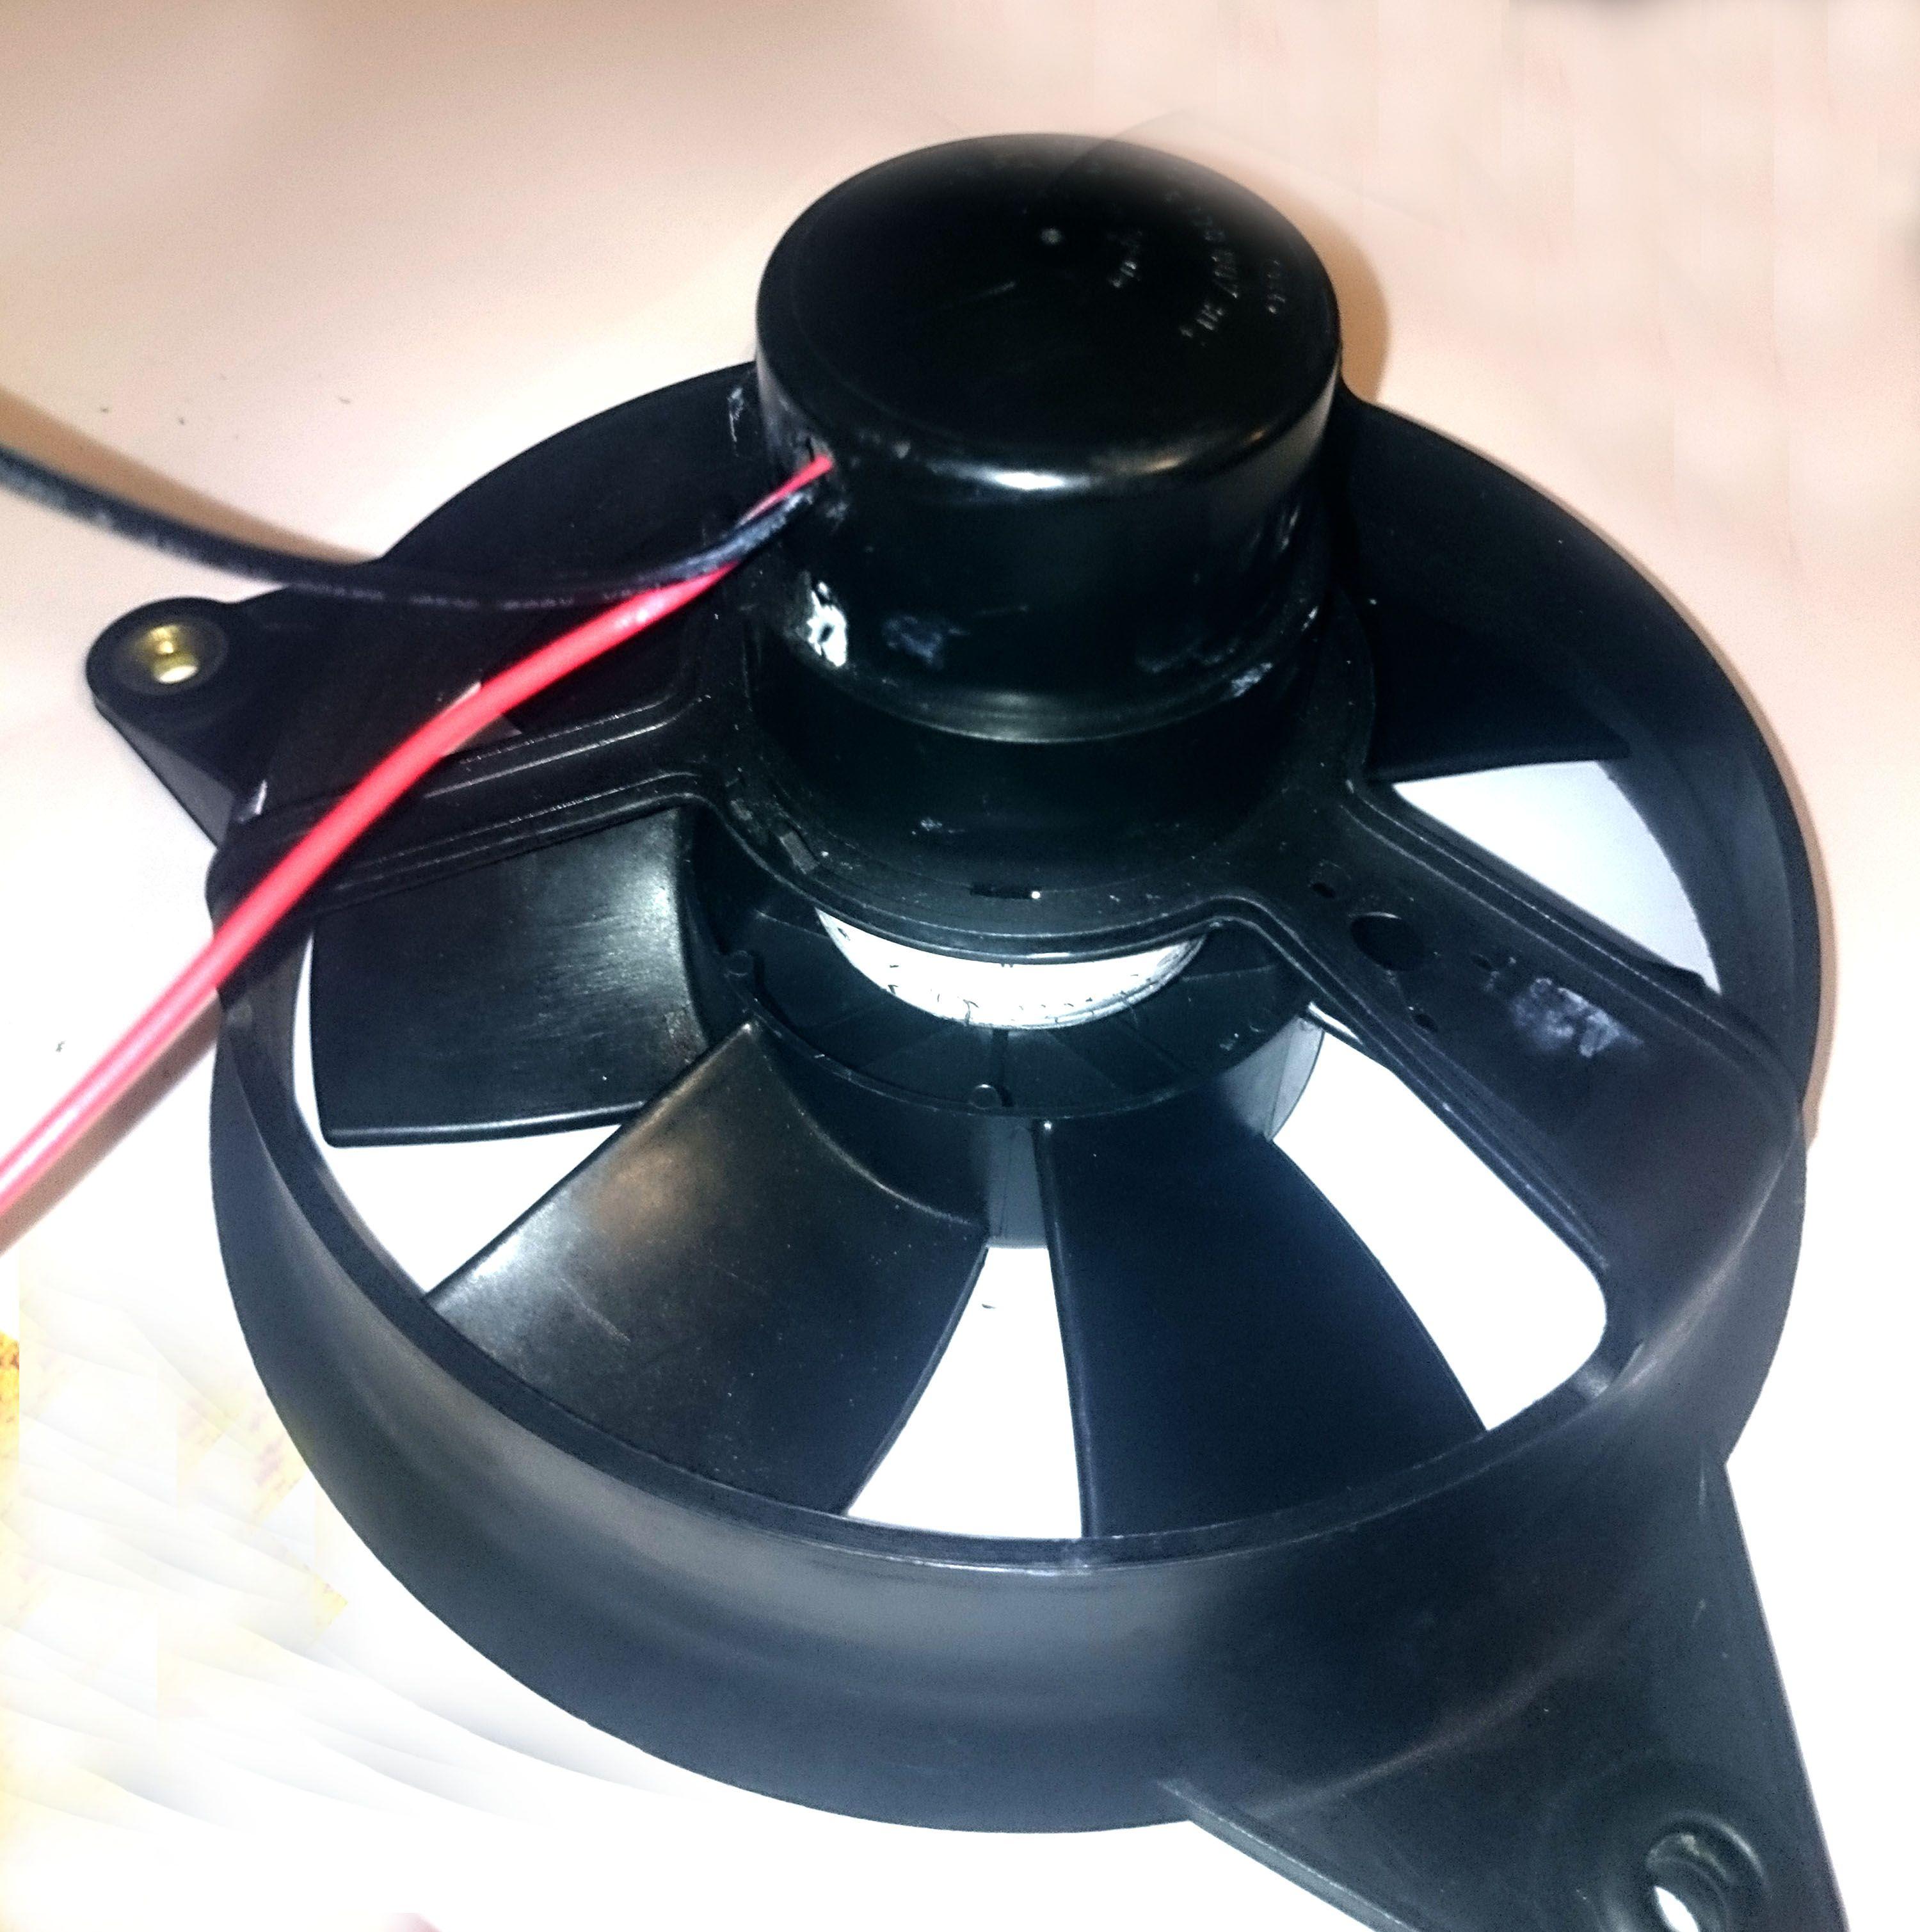 Is my fan faulty? 73f1b74c3ce549befb0de19cbcb25d0e